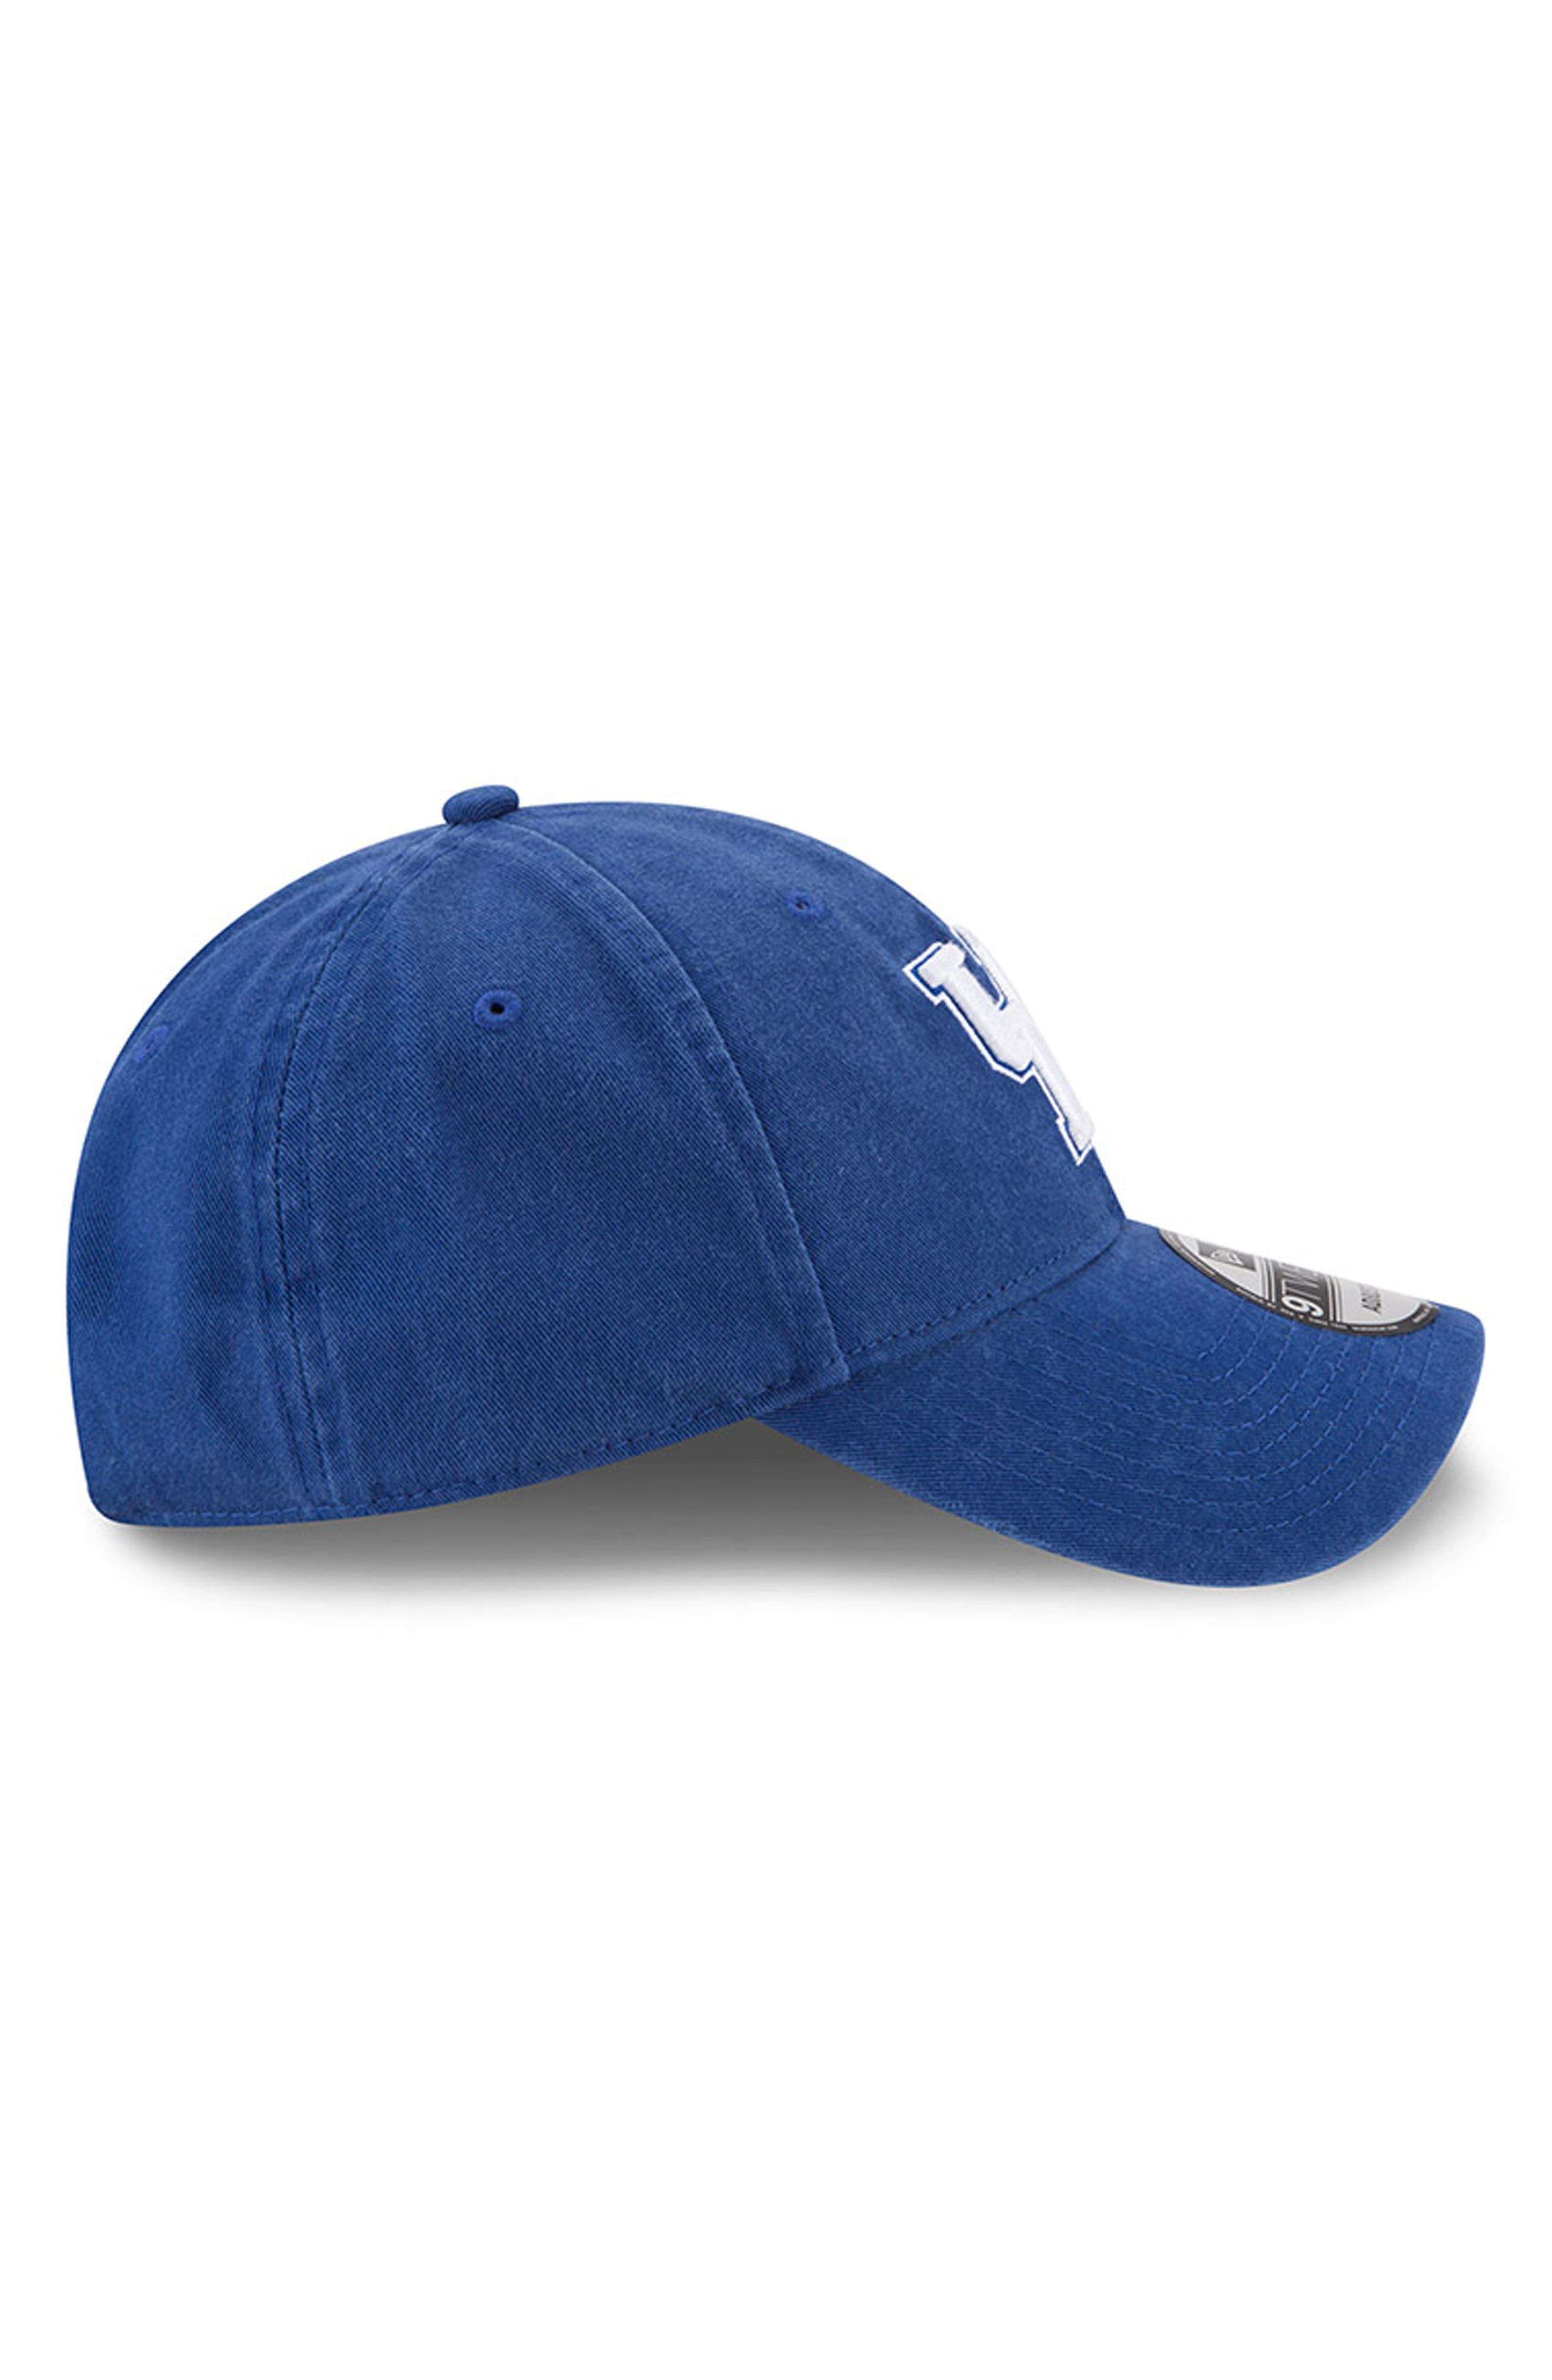 New Era Collegiate Core Classic - Kentucky Wildcats Baseball Cap,                             Alternate thumbnail 4, color,